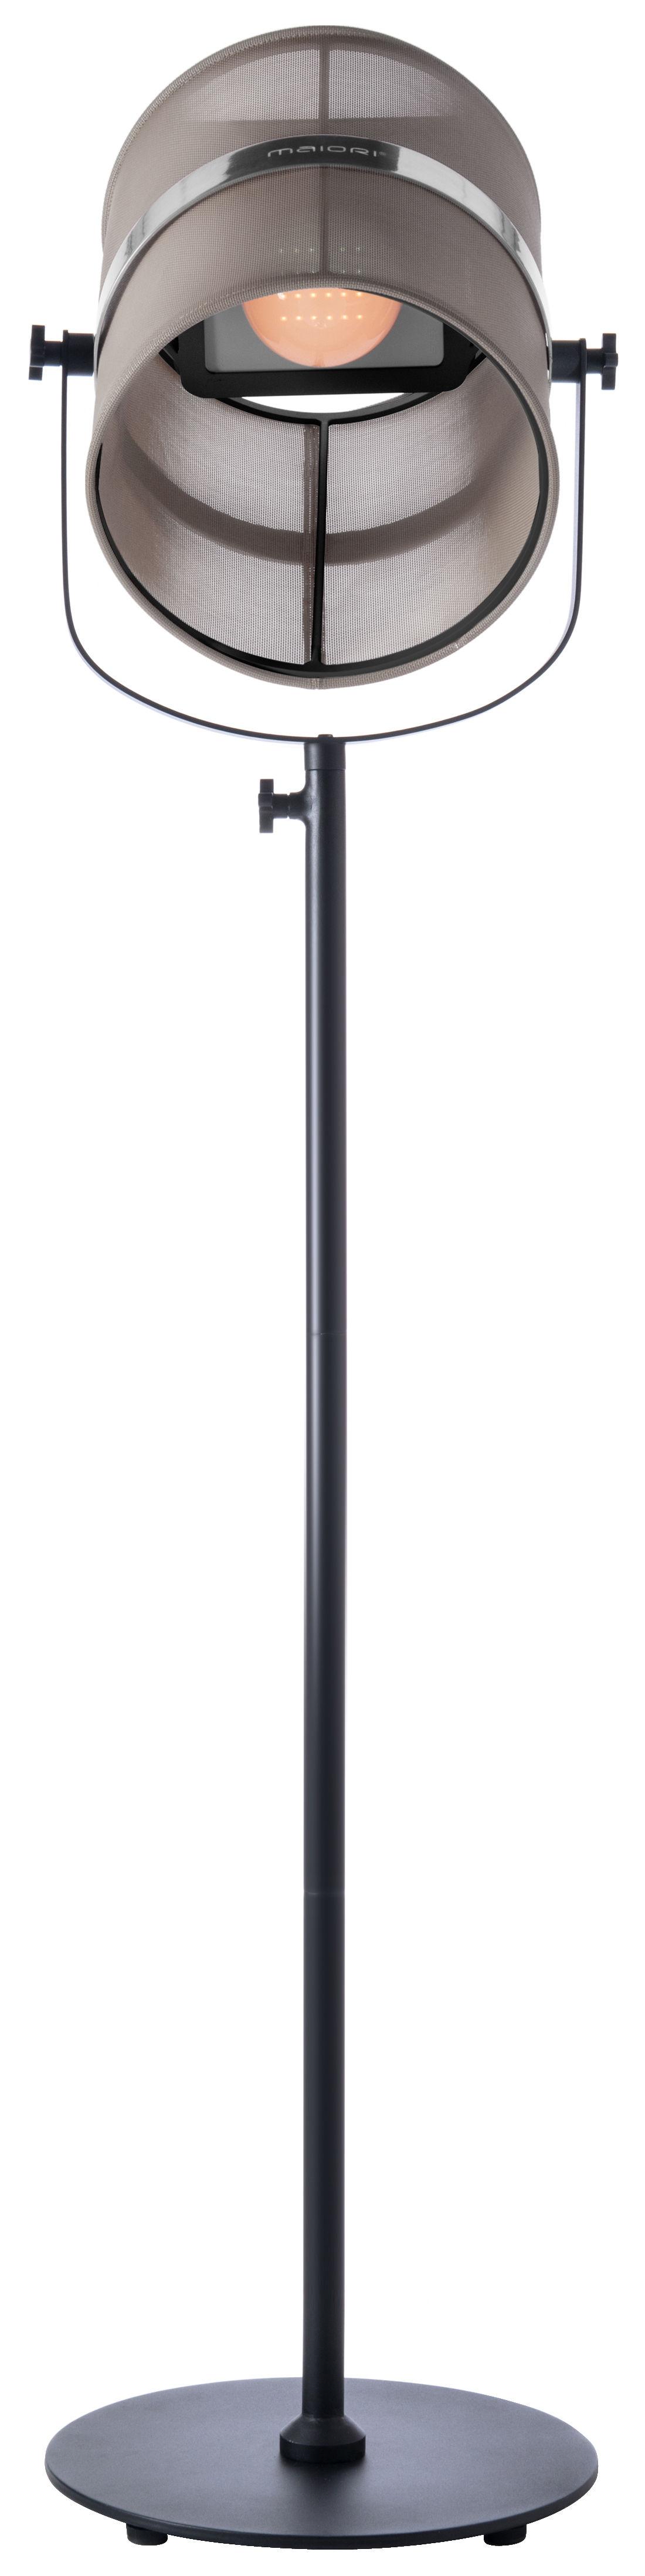 la lampe paris led solar floorlamp solar structure black diffuser light taupe by maiori. Black Bedroom Furniture Sets. Home Design Ideas